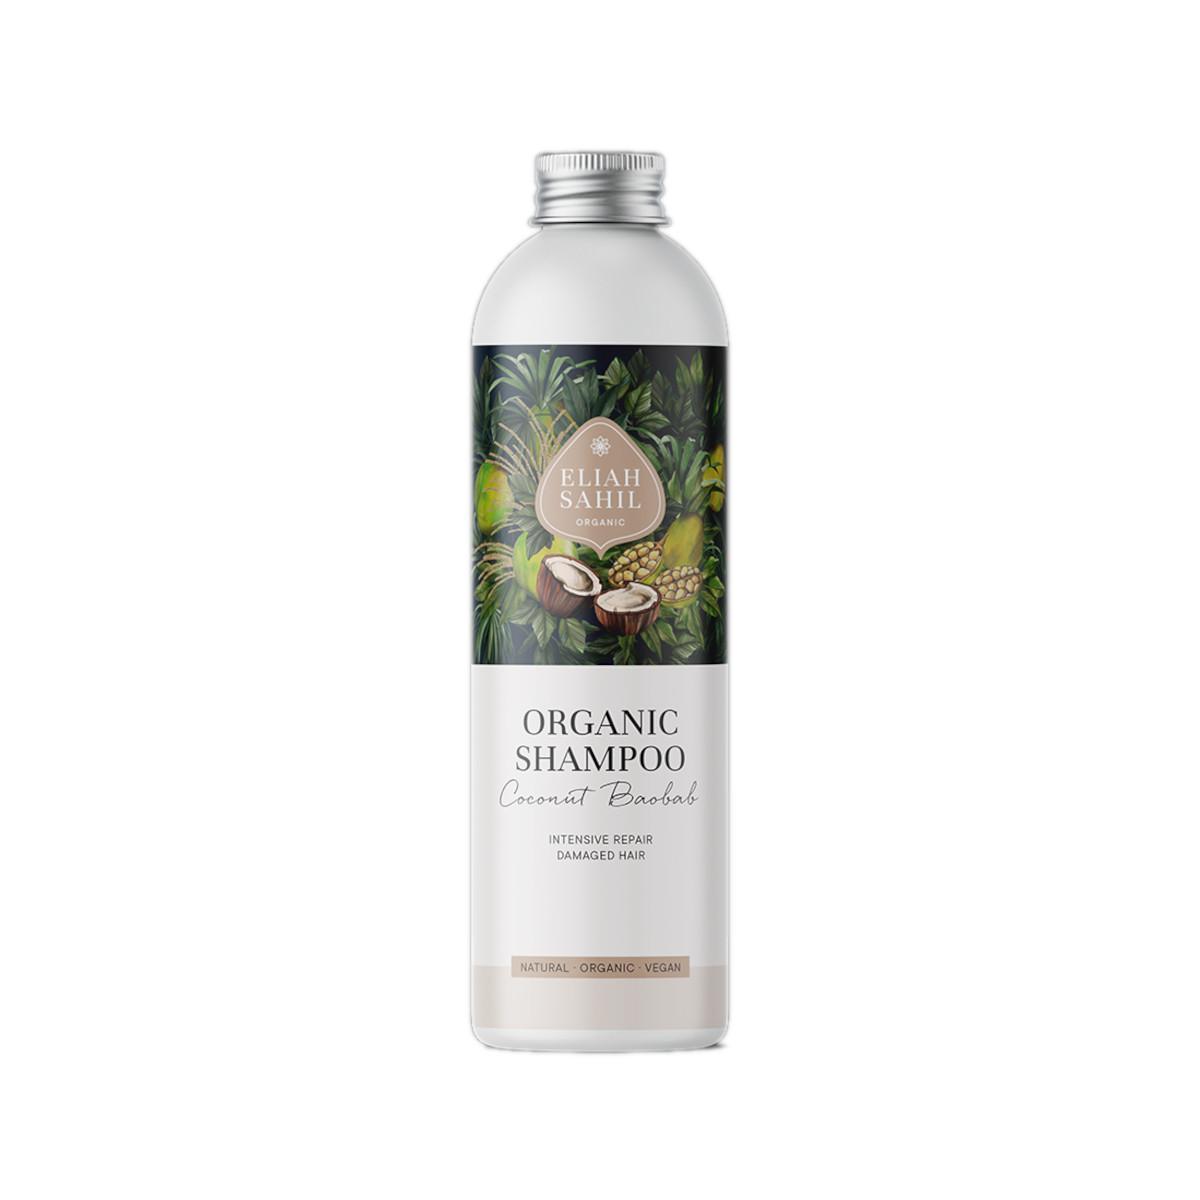 Eliah Sahil Organický šampon kokos a baobab